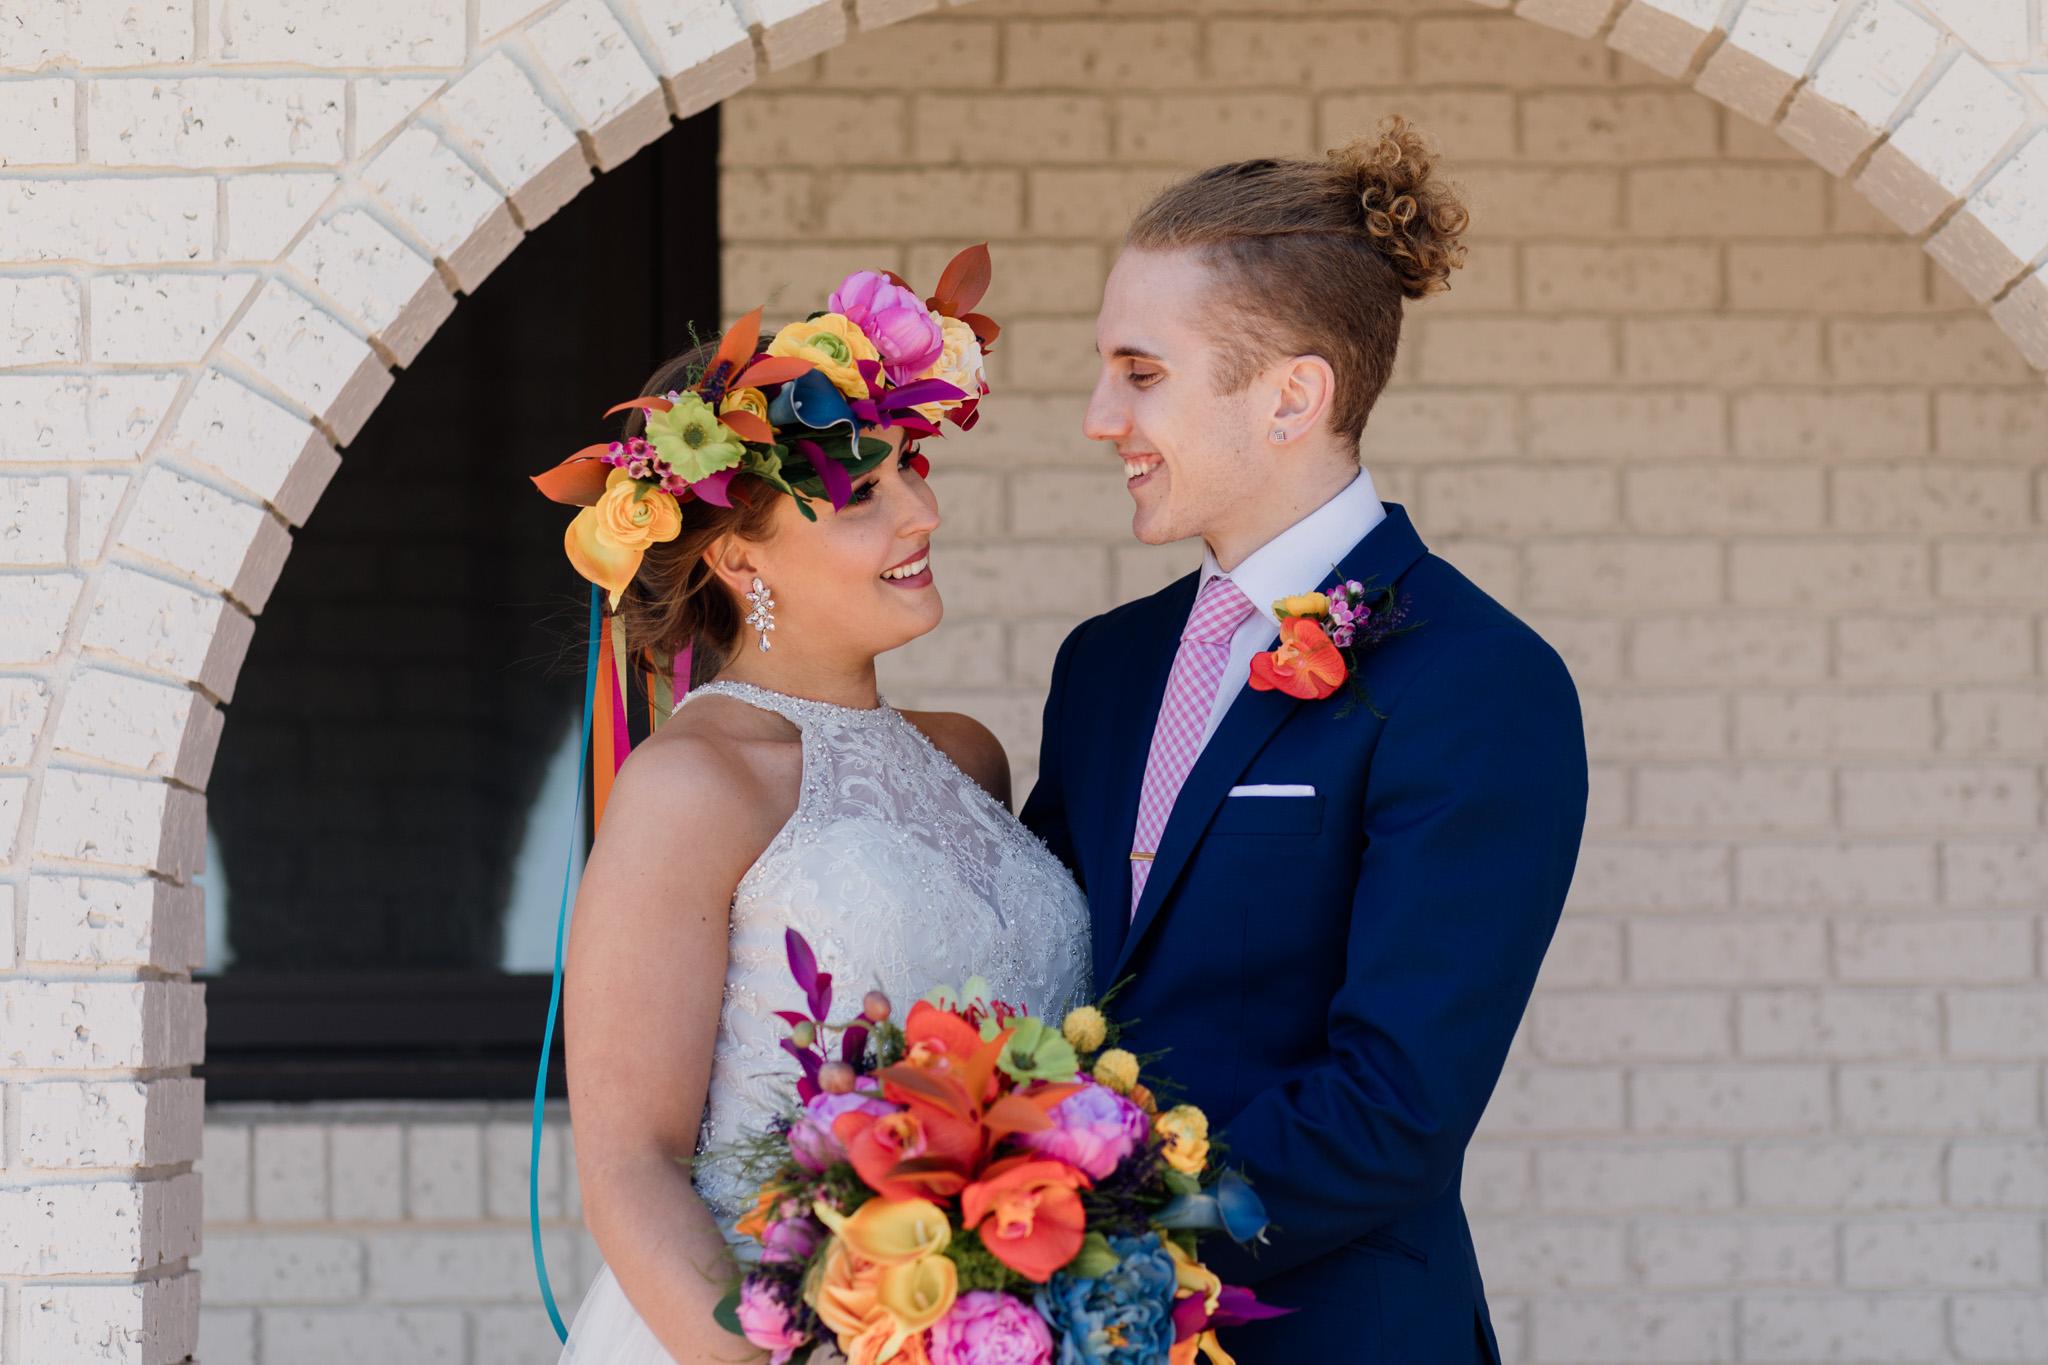 winnipeg-wedding-starlit point-30.jpg